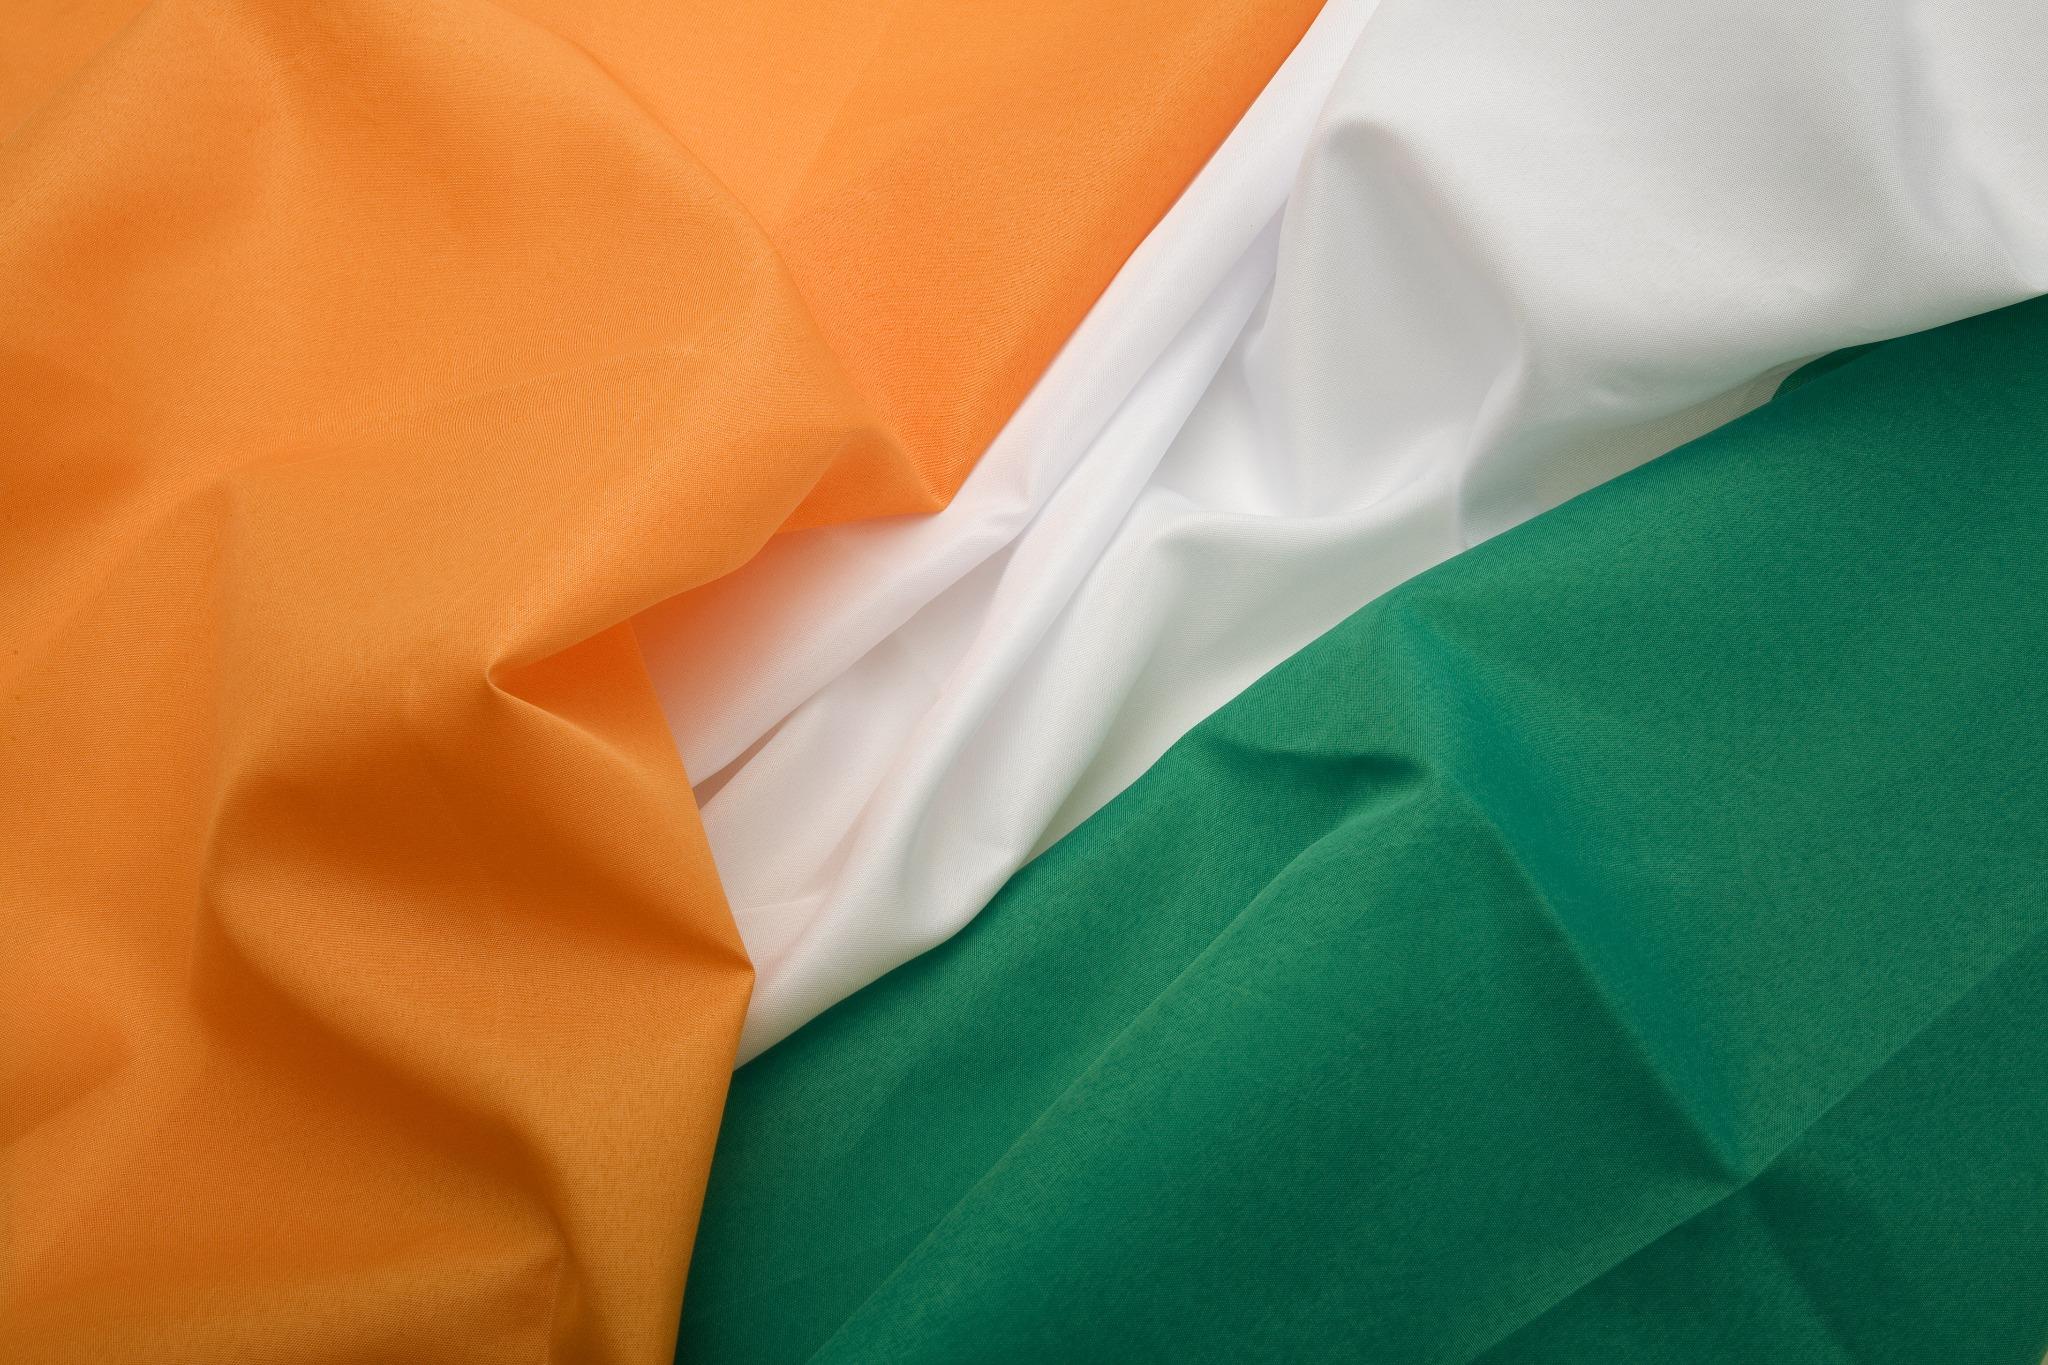 The tri-color Irish flag